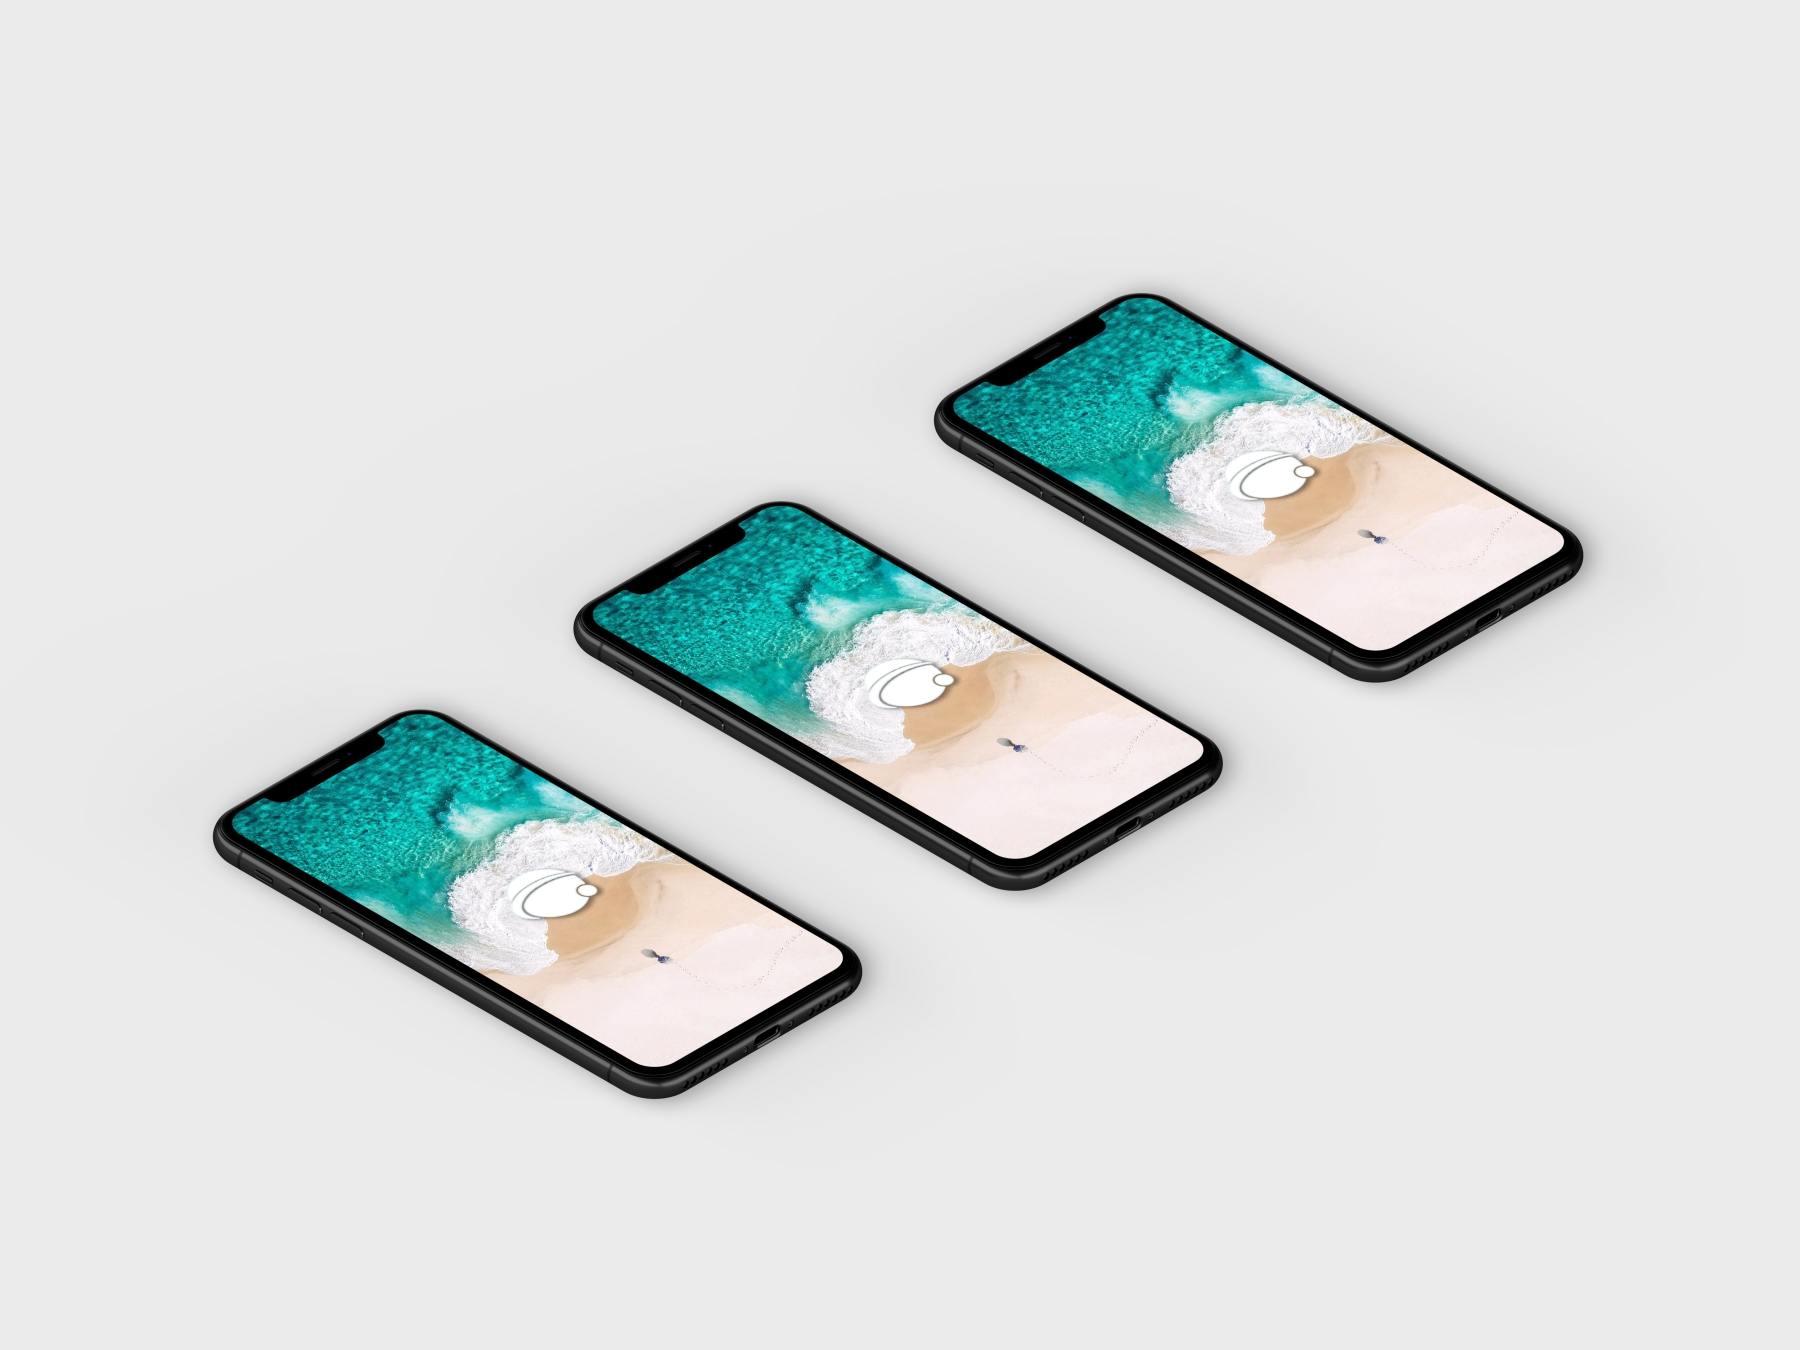 1569727019 7101f8d4592e219 - 苹果iPhoneX UI样机